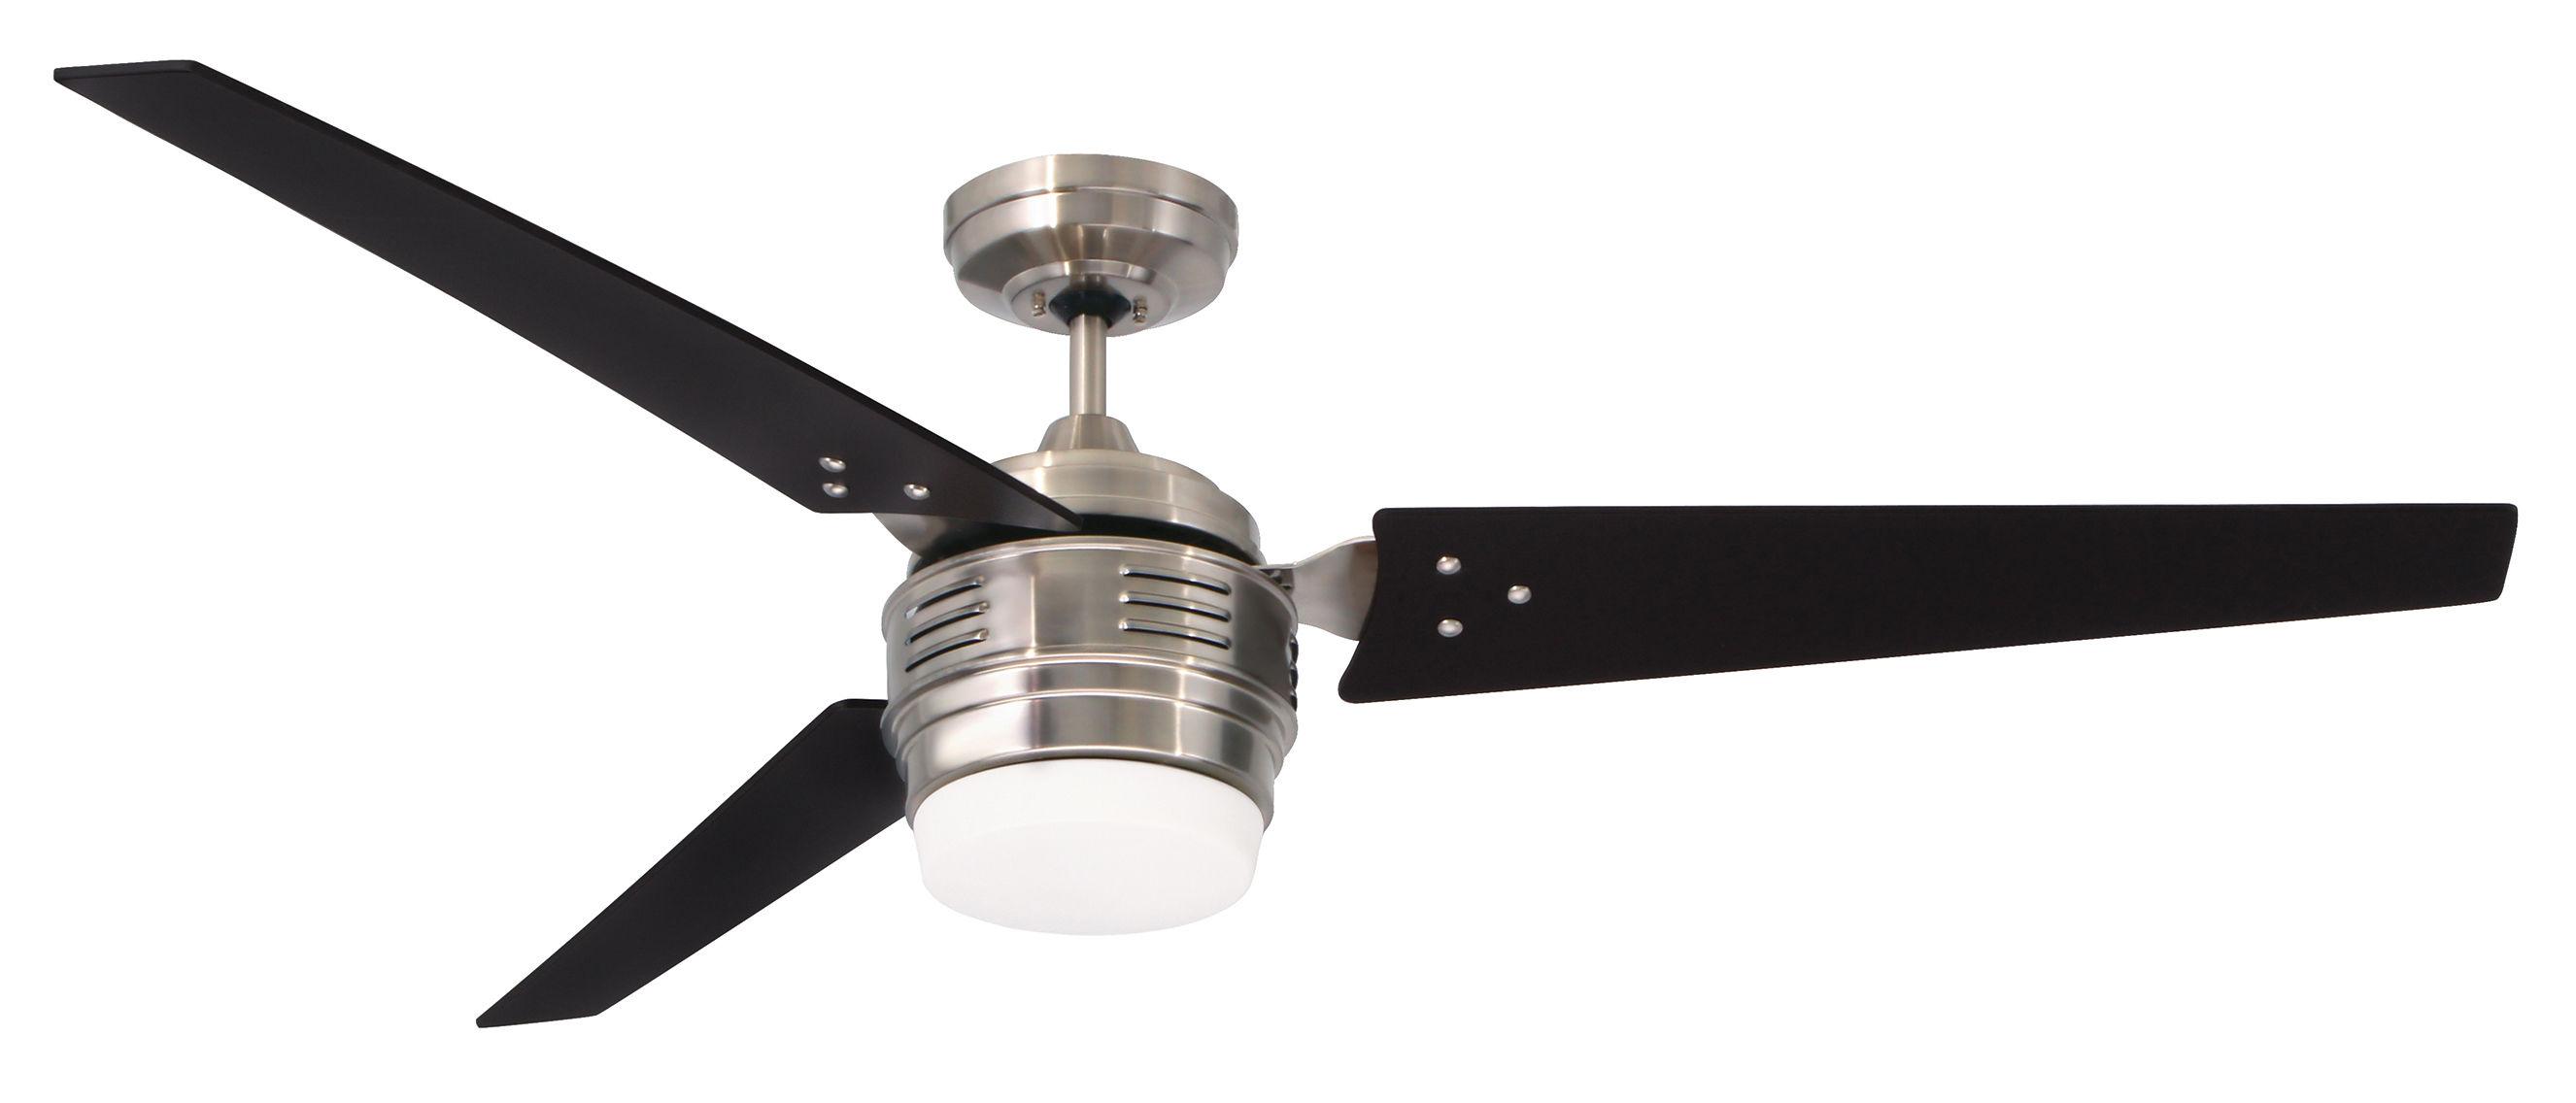 "Emerson CF766SW Satin White 4th Avenue 60"" 3 Blade Ceiling Fan"